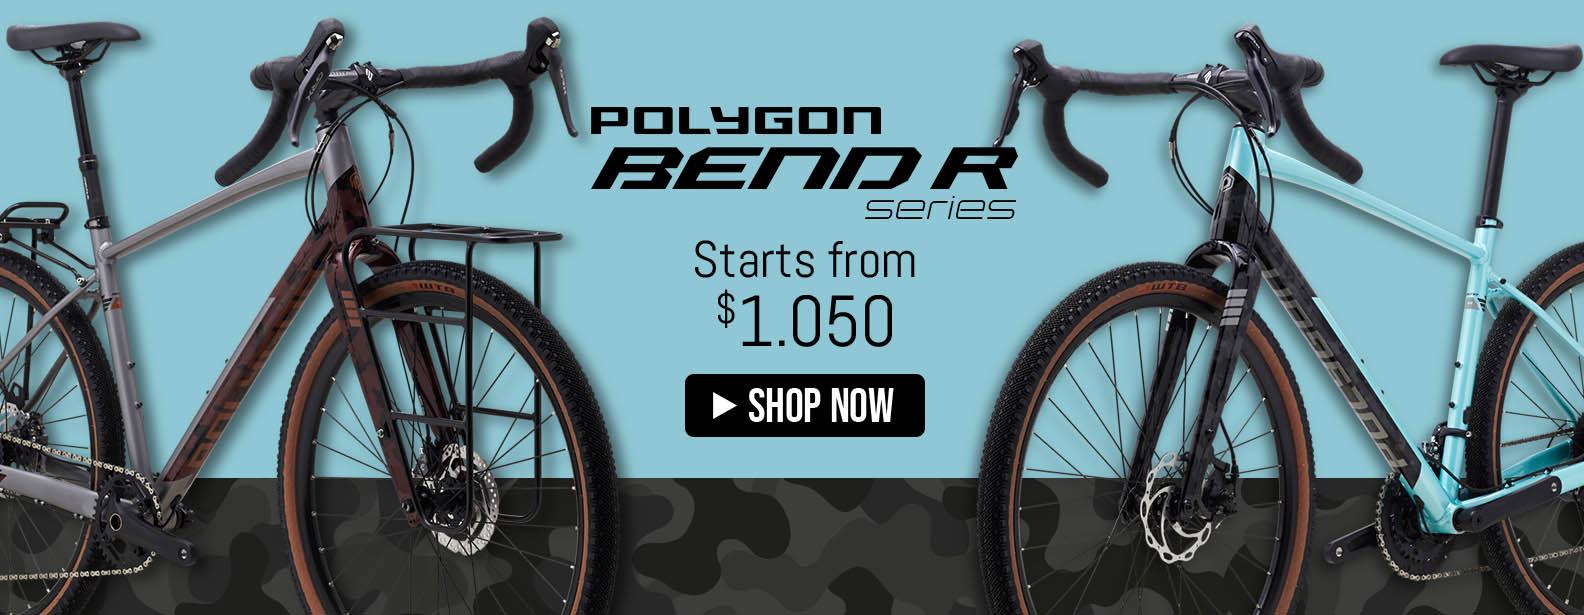 Buy Polygon Bend R Series